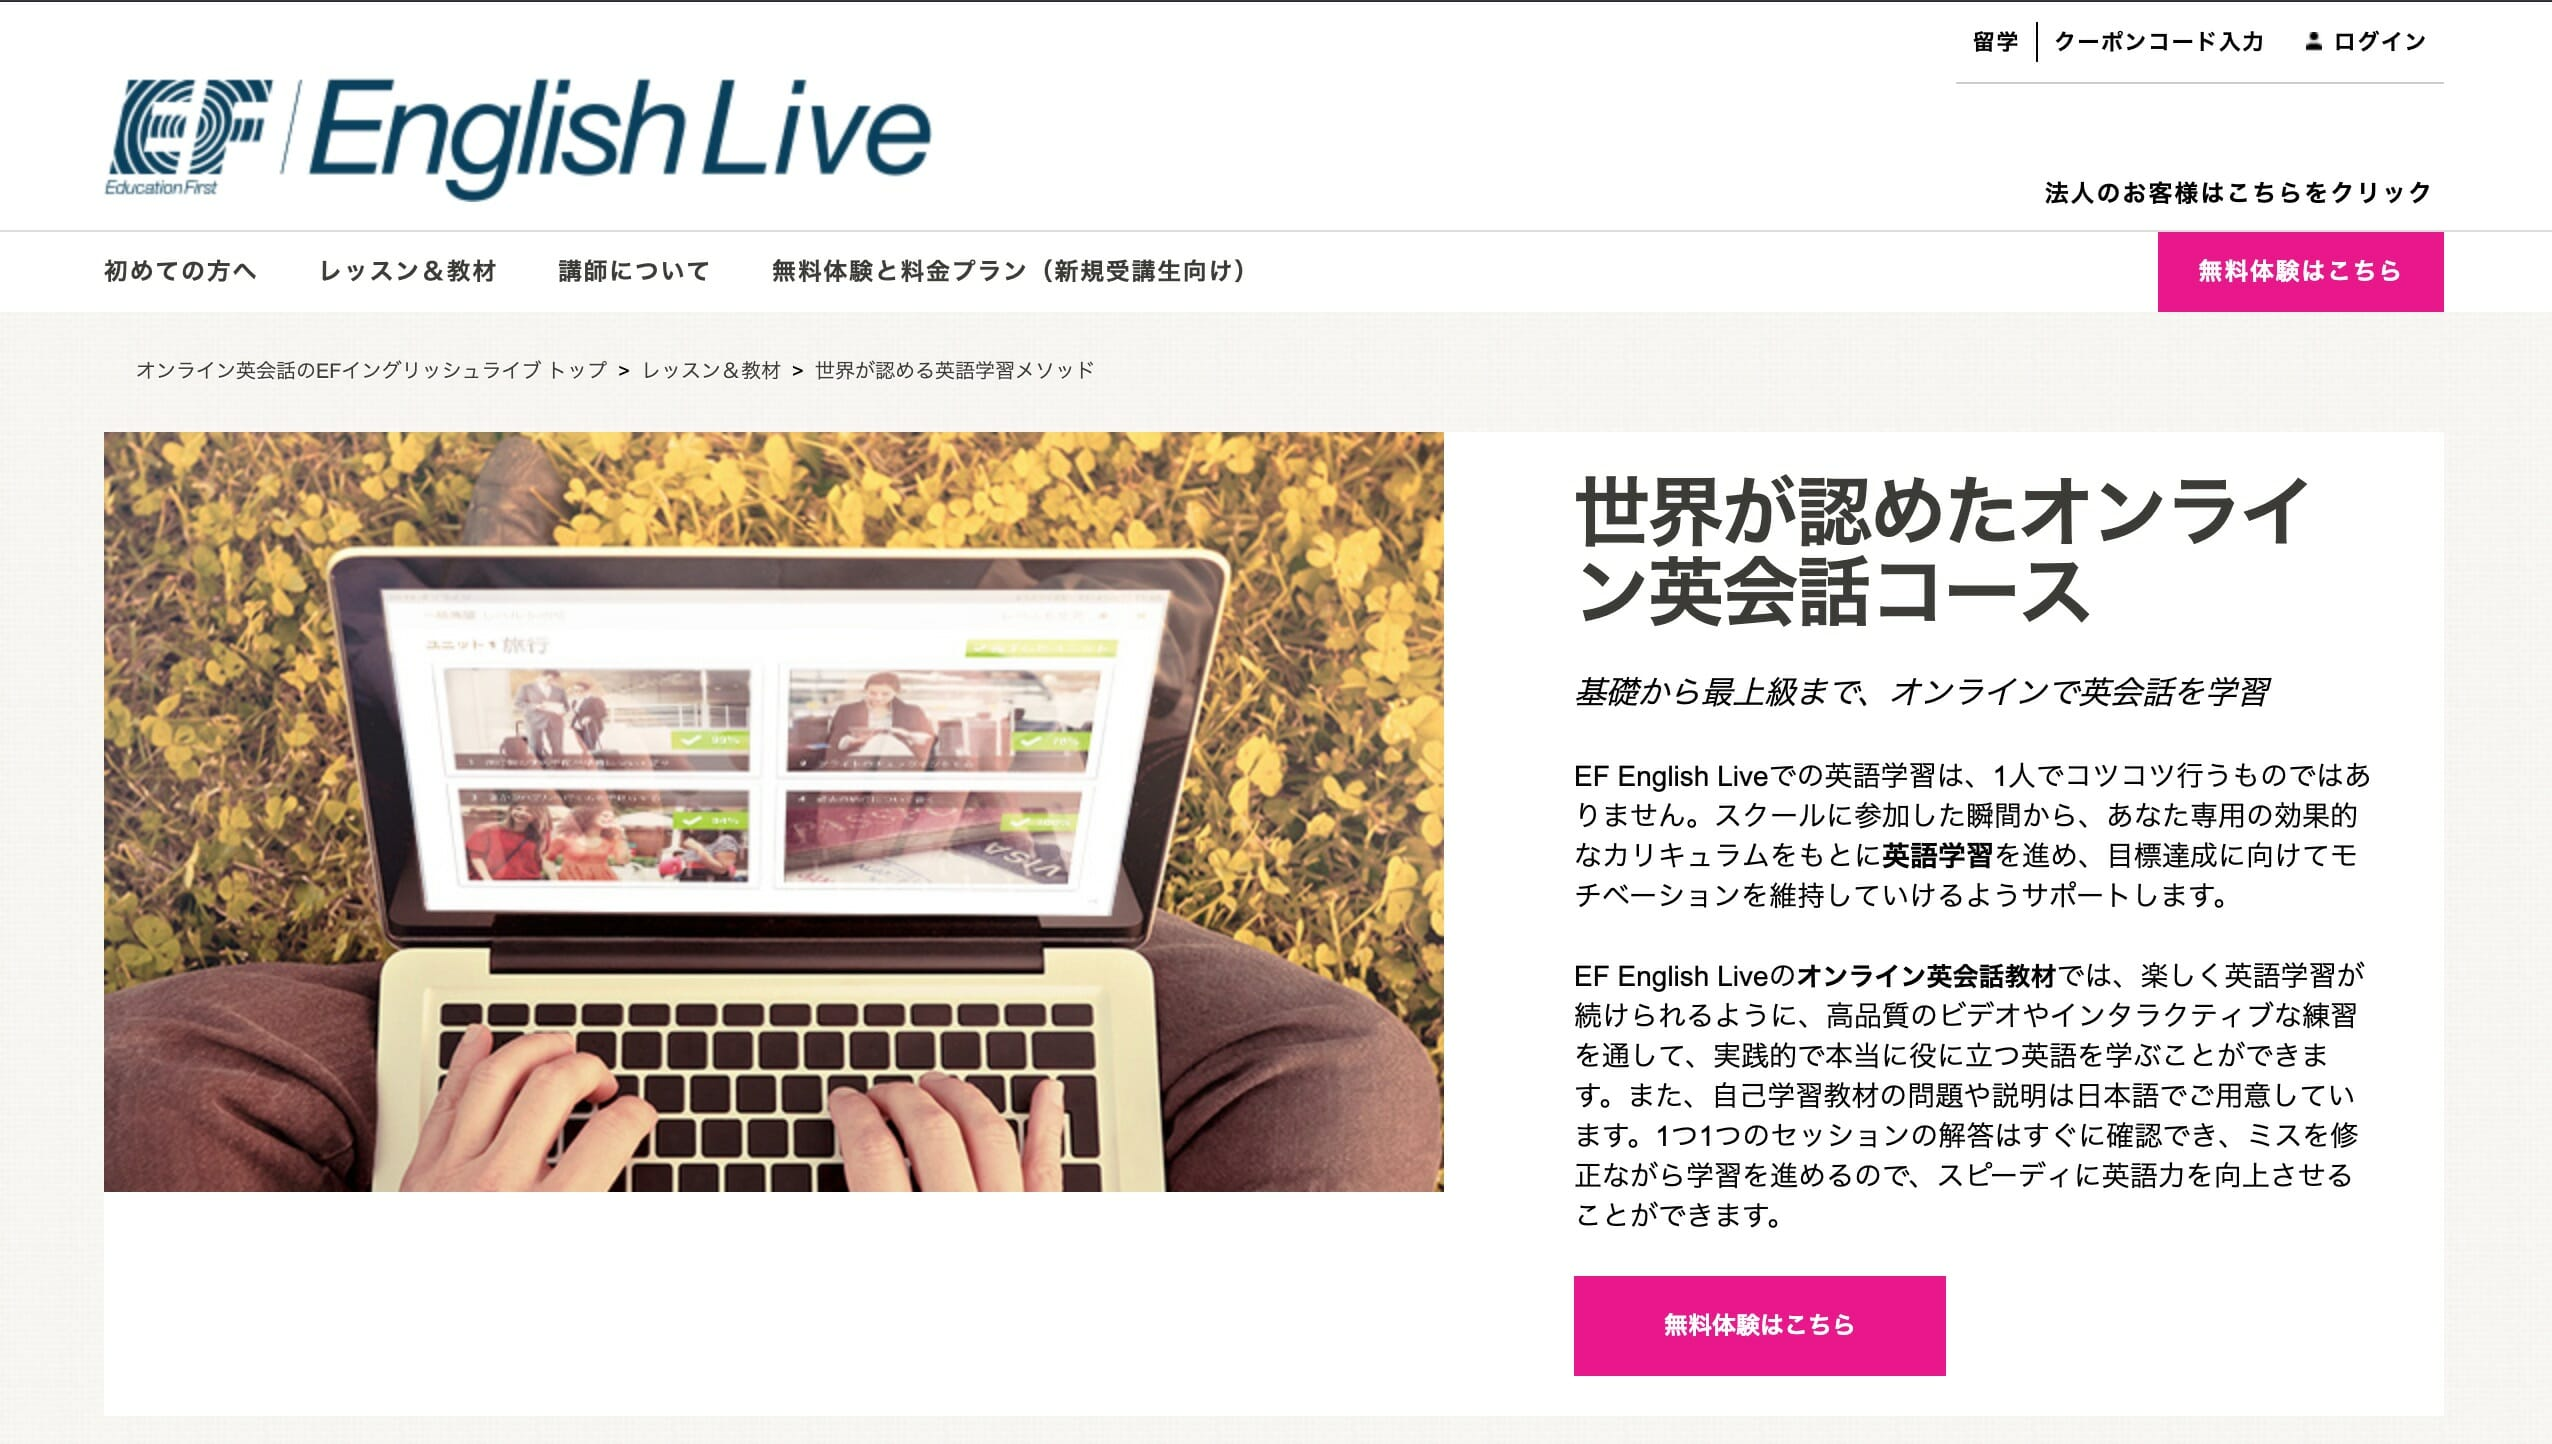 EF English Live (イーエフイングリッシュライブ)